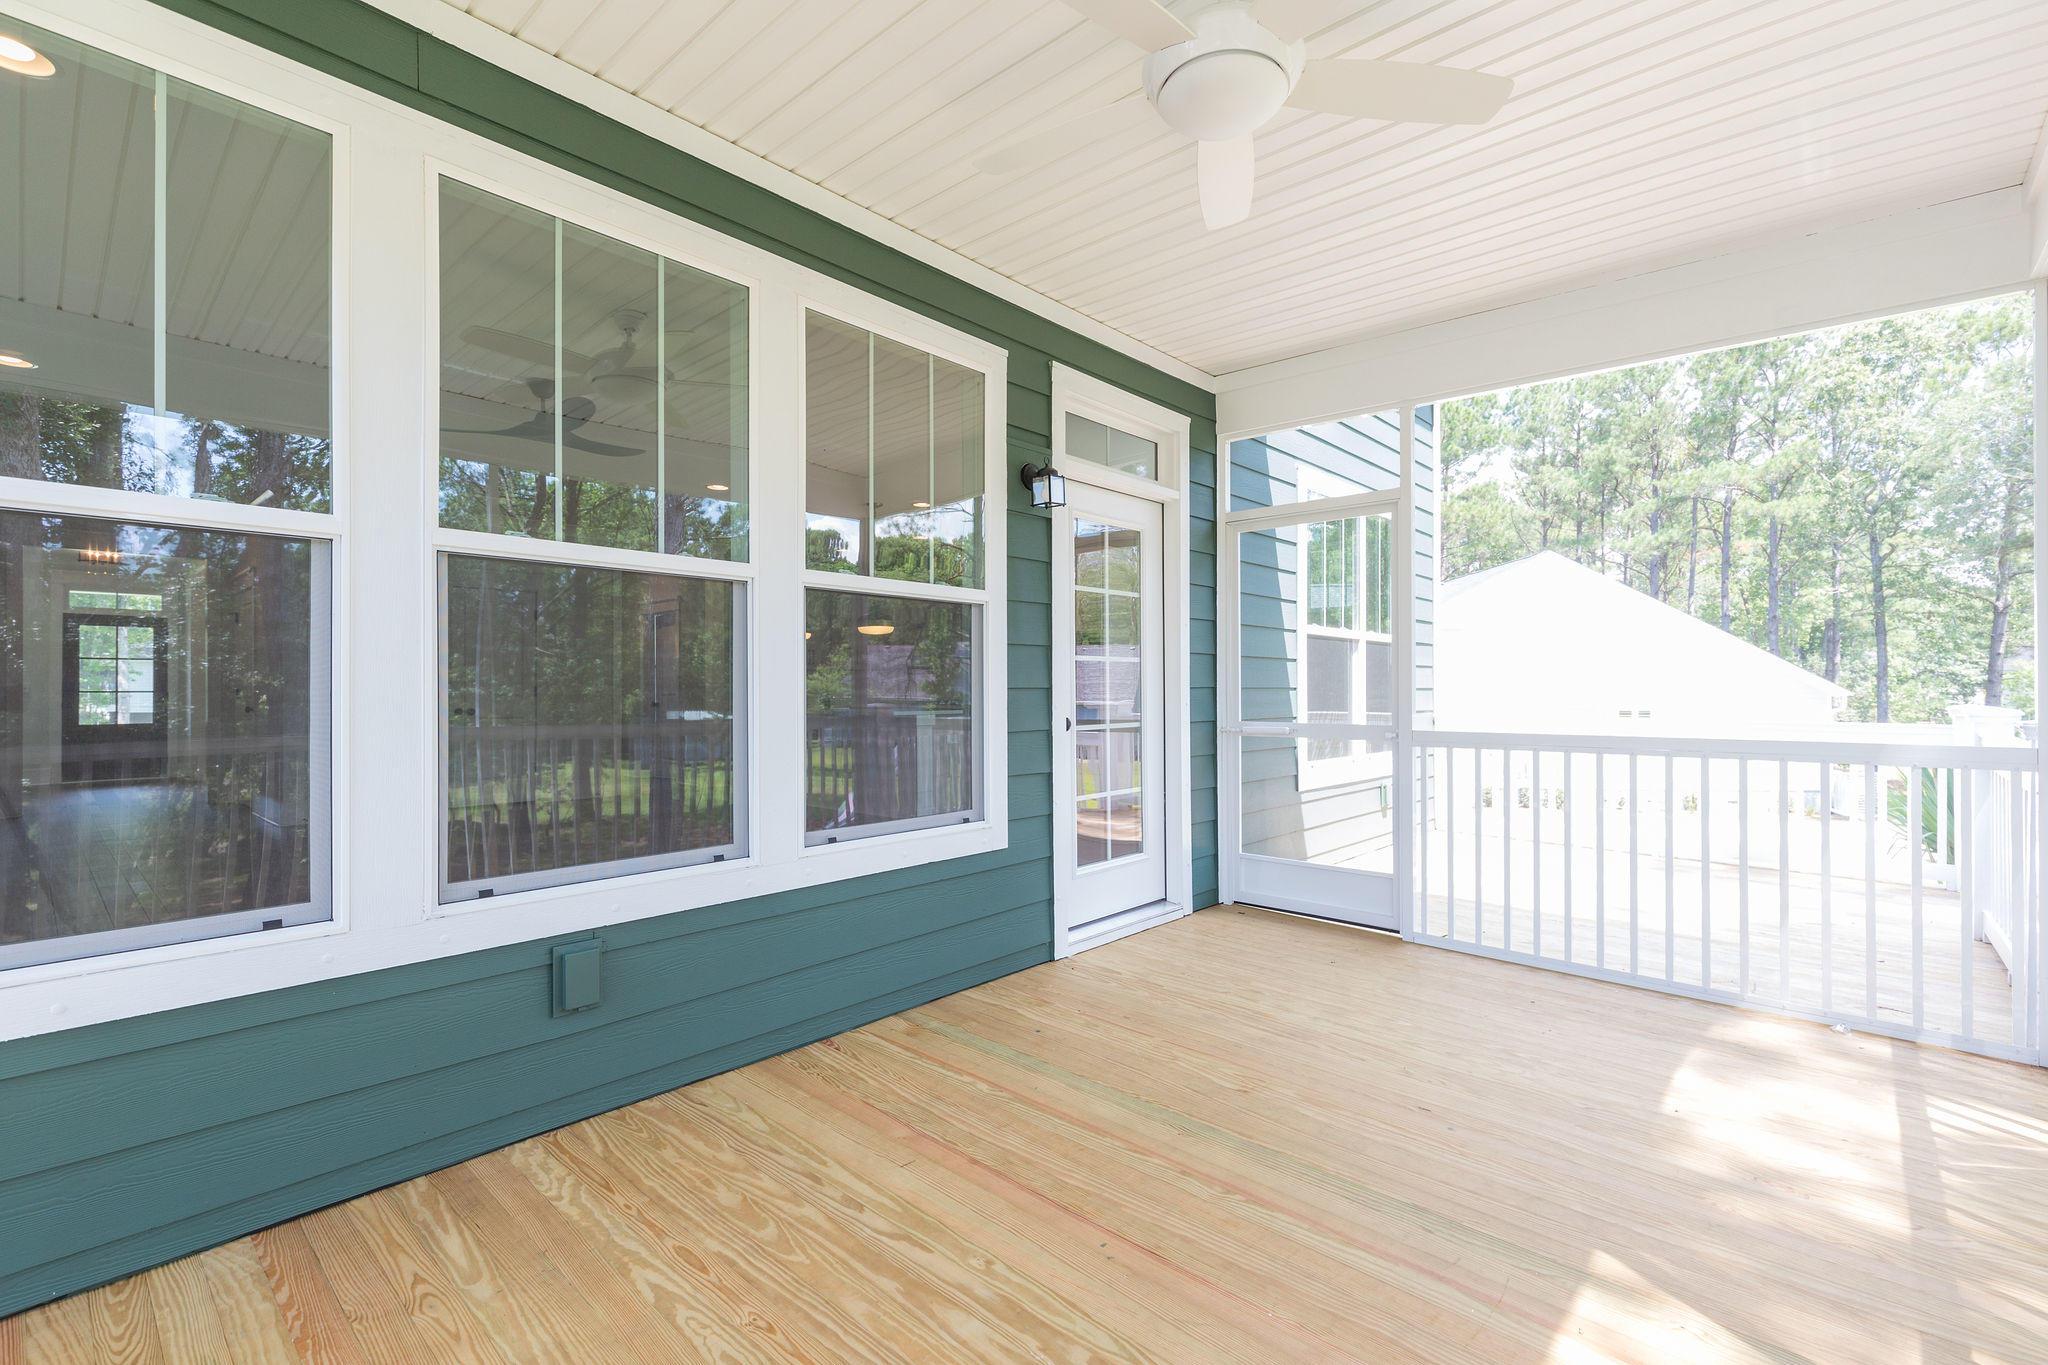 Rushland Plantation Homes For Sale - 2421 Rushland Landing, Johns Island, SC - 36